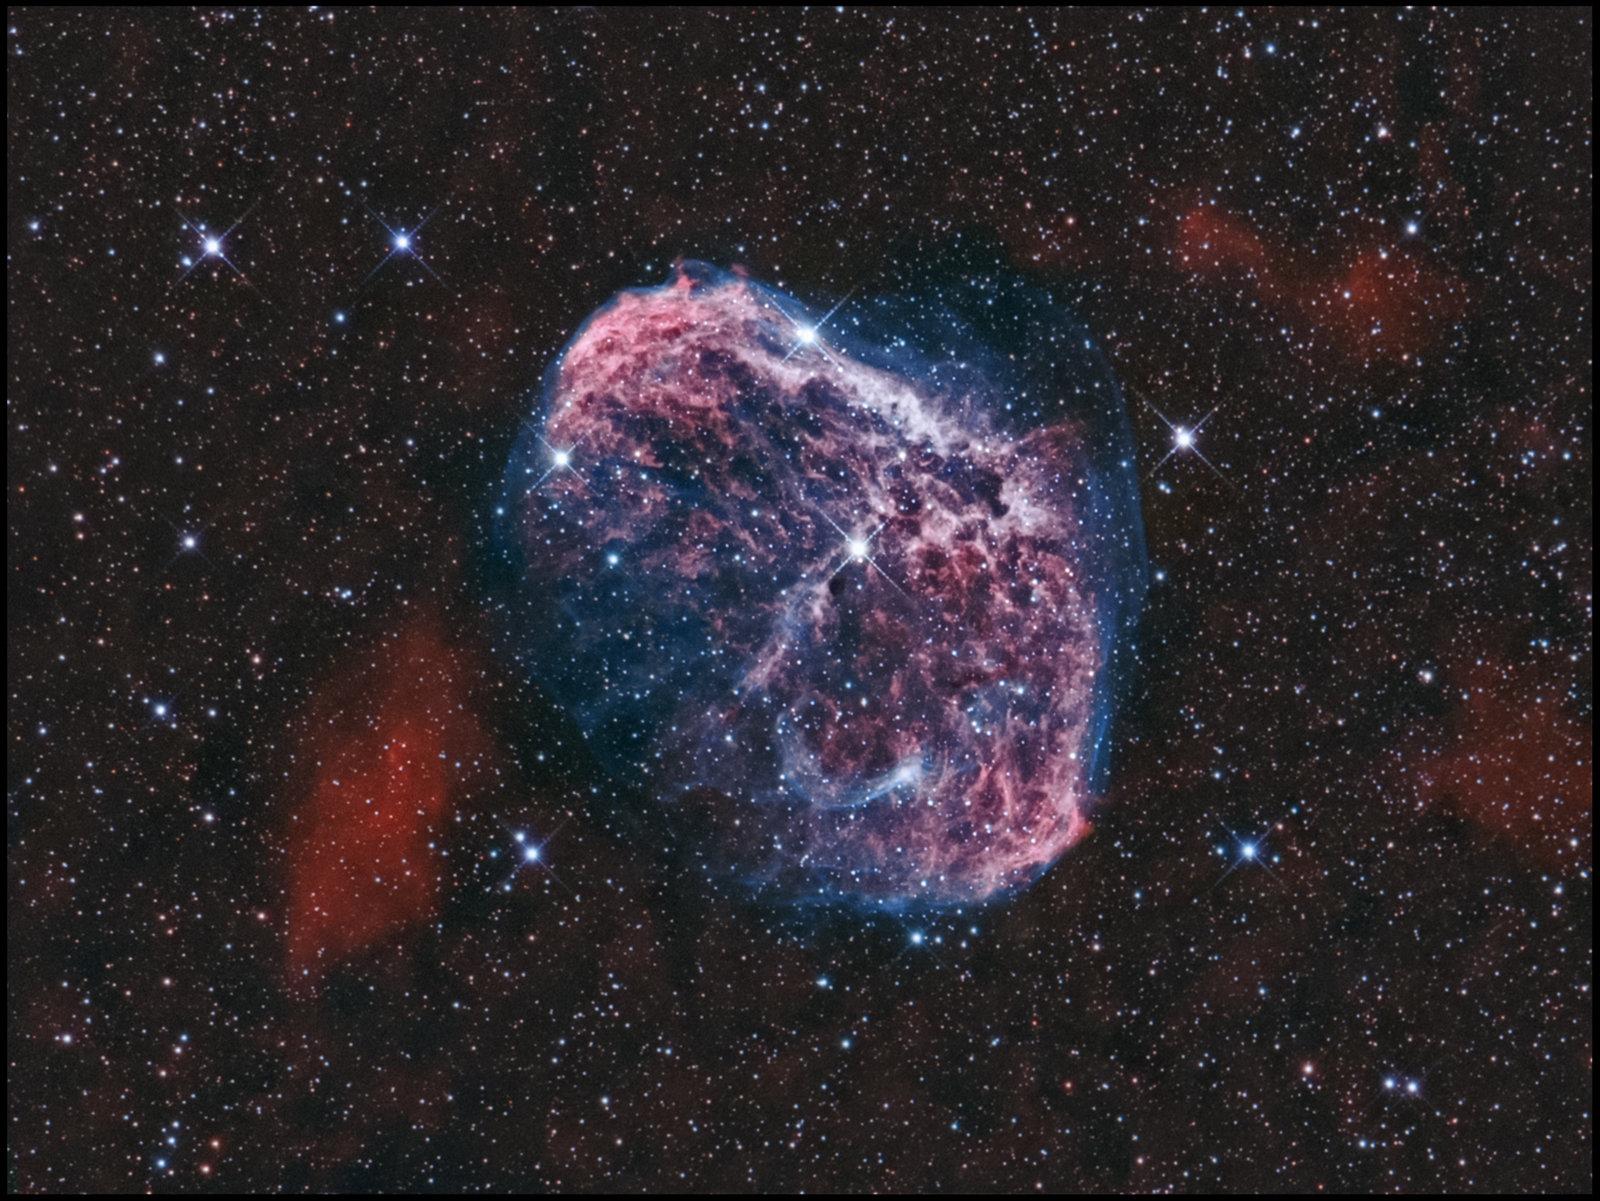 NGC_6888_bicolor13.thumb.jpg.e52189c60615060da2216385a4c8d0b0.jpg